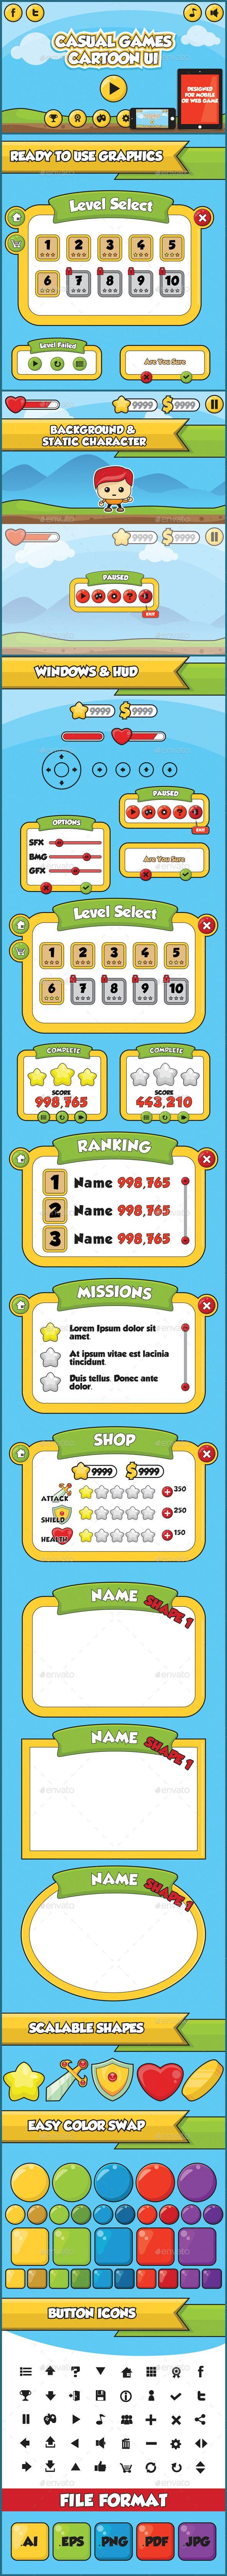 Cartoon Games UI Kit Template PSD, Transparent PNG, Vector EPS, AI Illustrator. Download here: https://graphicriver.net/item/cartoon-games-ui-kit/9379283?ref=ksioks